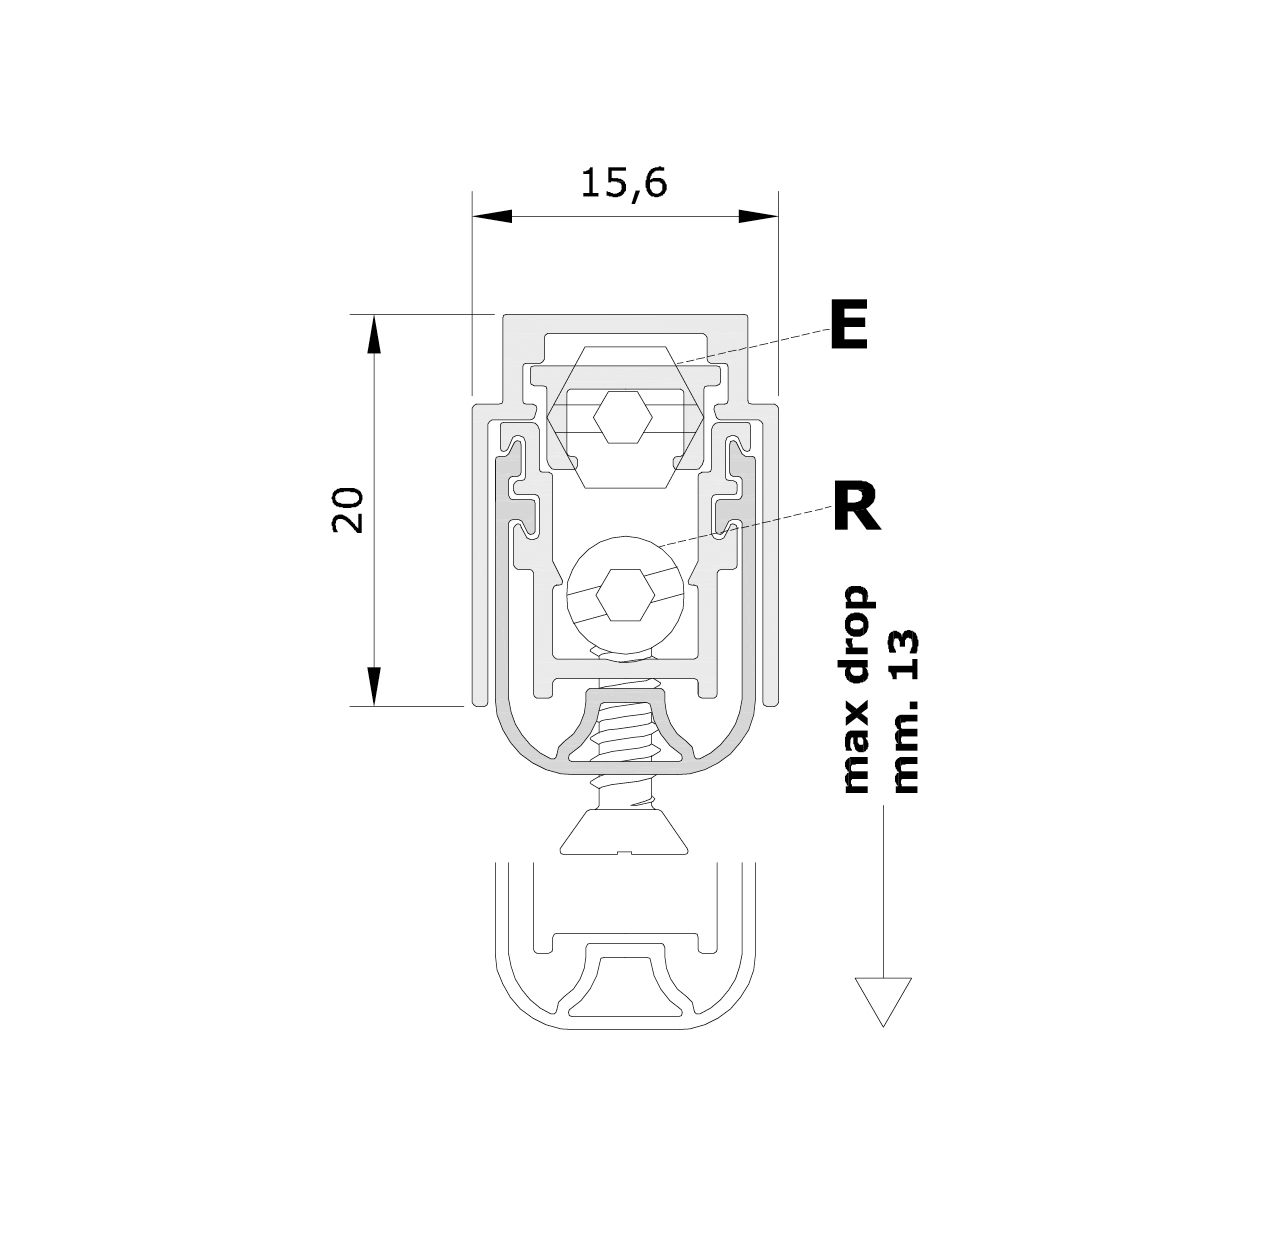 Misure standard (mm) per il paraspifferi Serie Pressure 1770